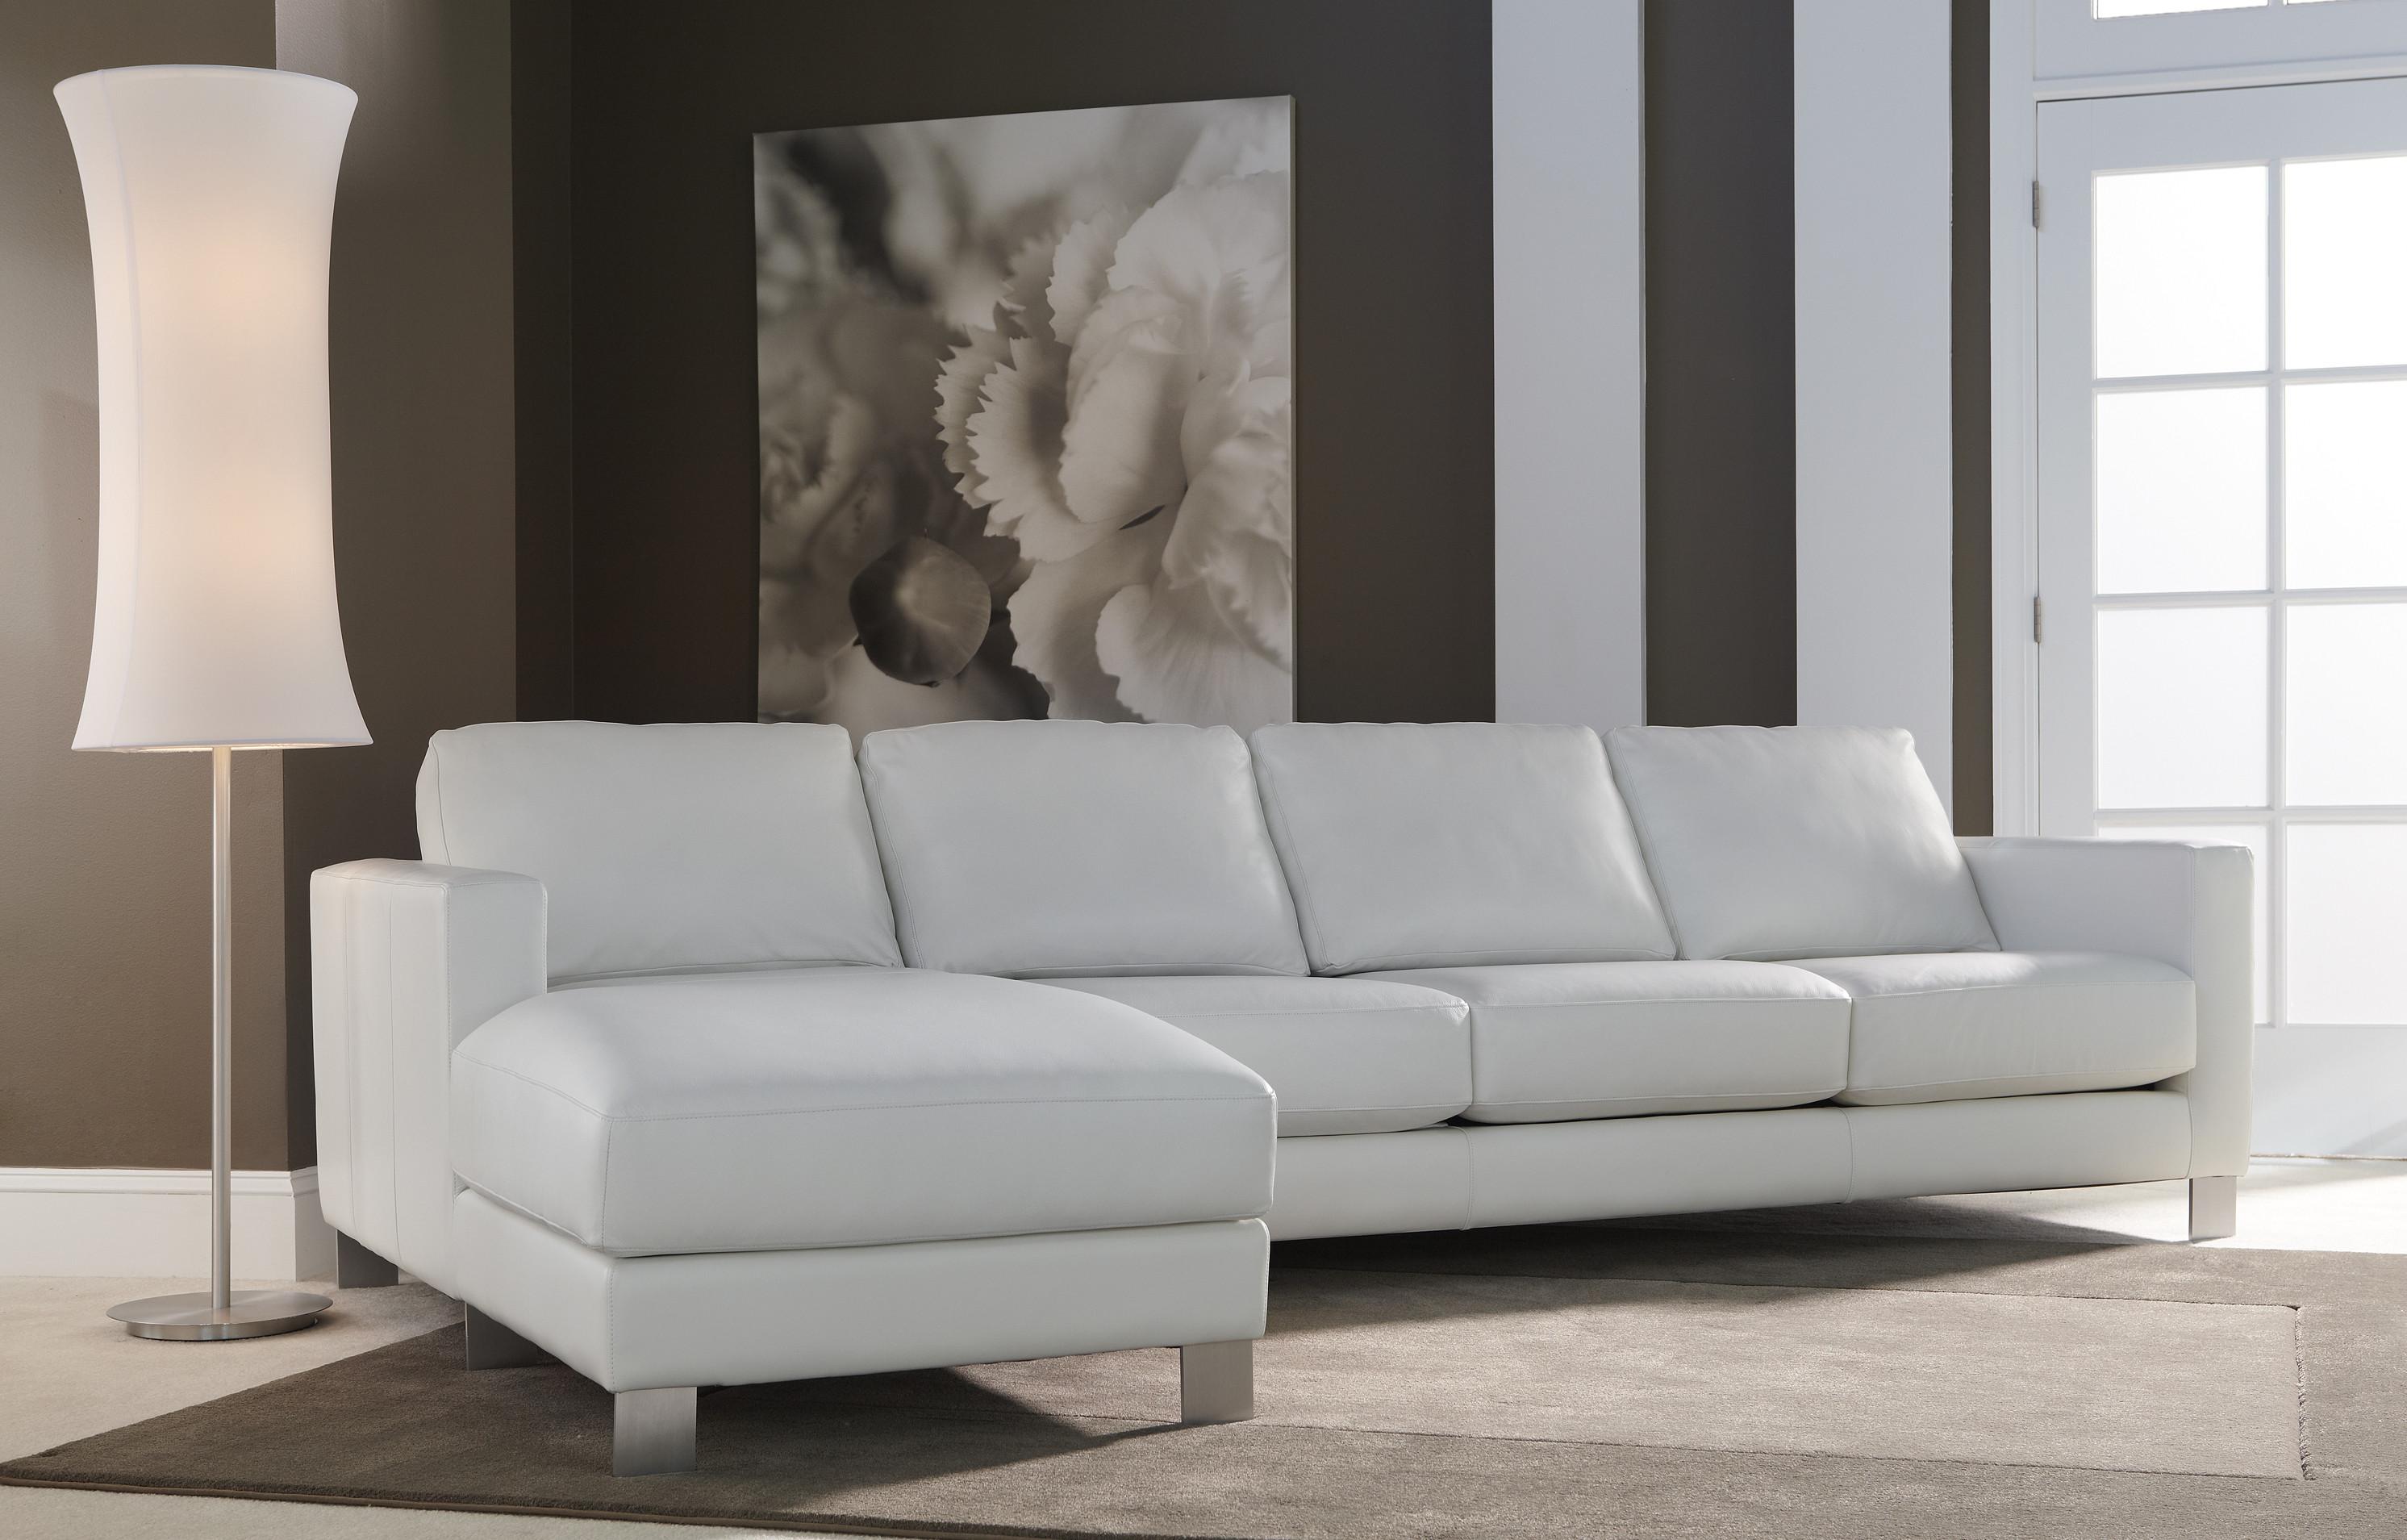 Kootenai Moon Furniture Sofa,Sectional,Chaise, lounge, Chair, bridgwater arm, quality